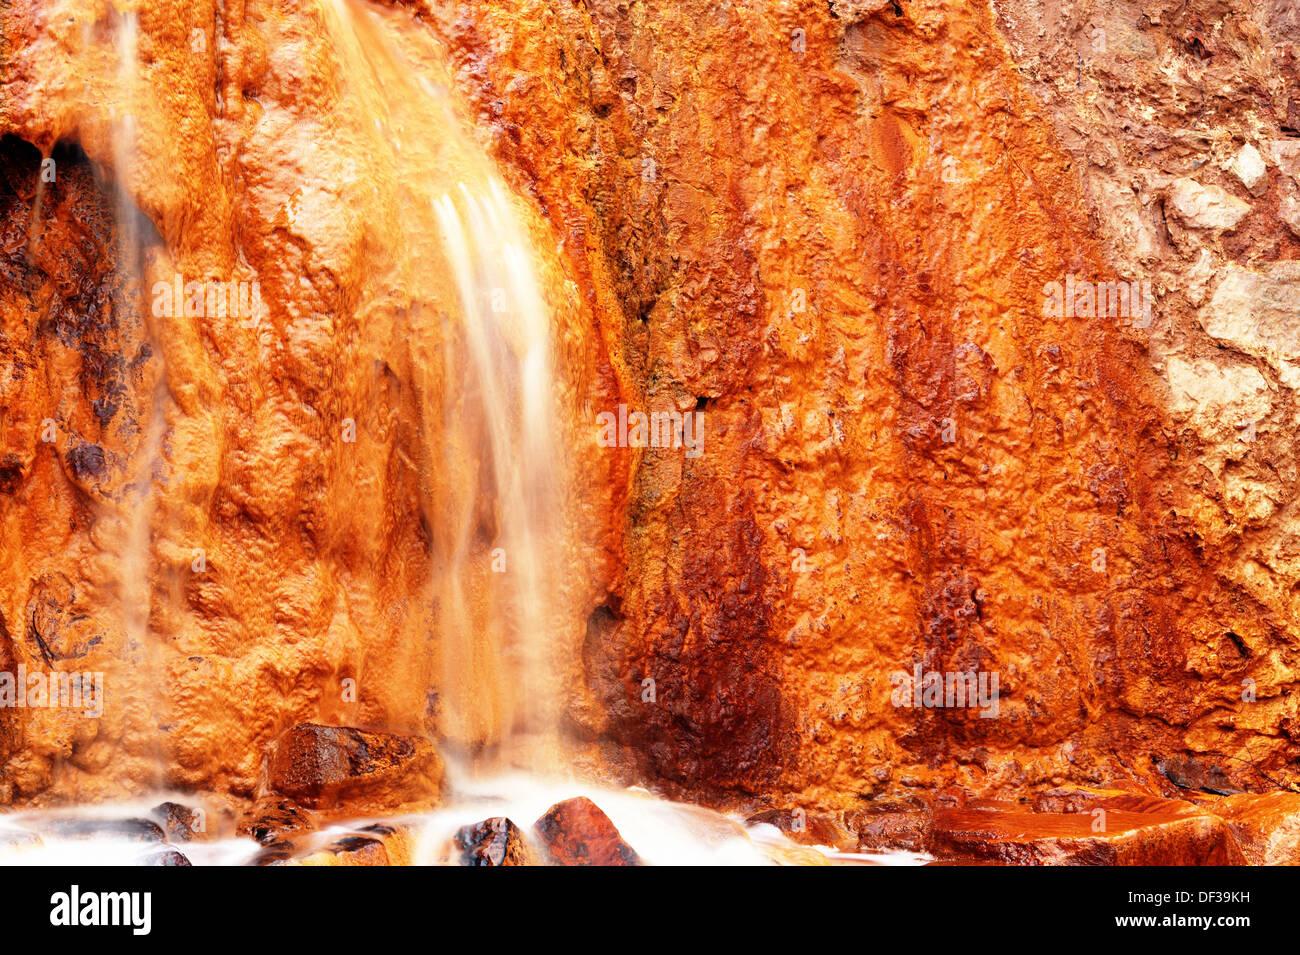 Stream of oxidized iron minerals. Río Tinto, Huelva province. Spain - Stock Image